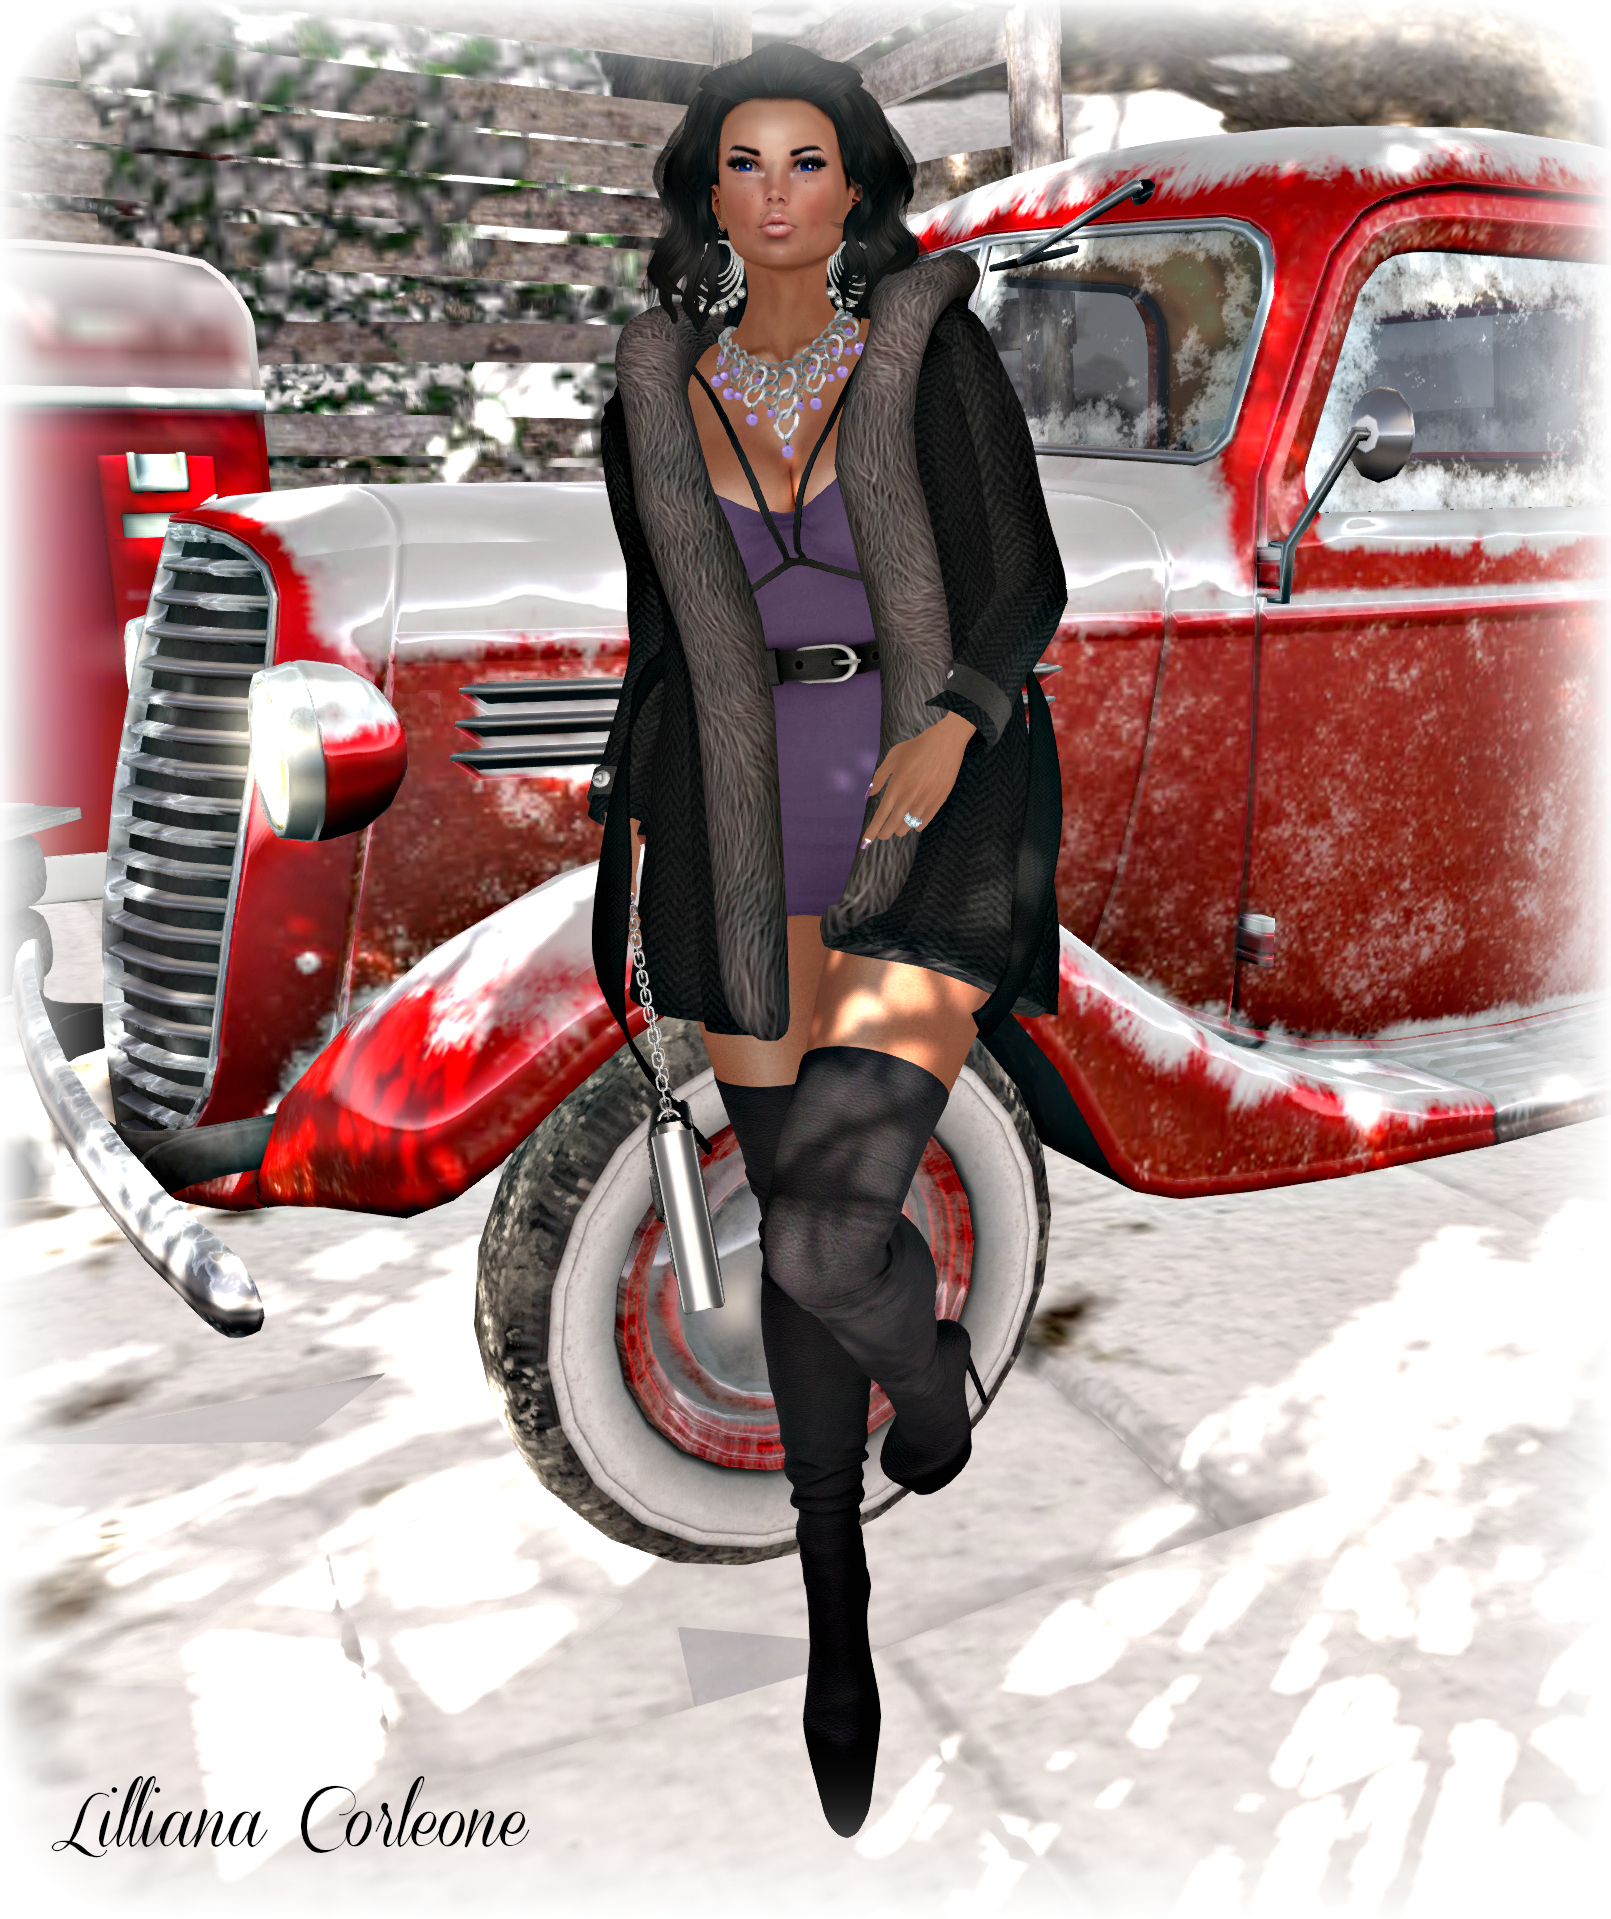 december-29th-blog-post-photo-4_croppedv2